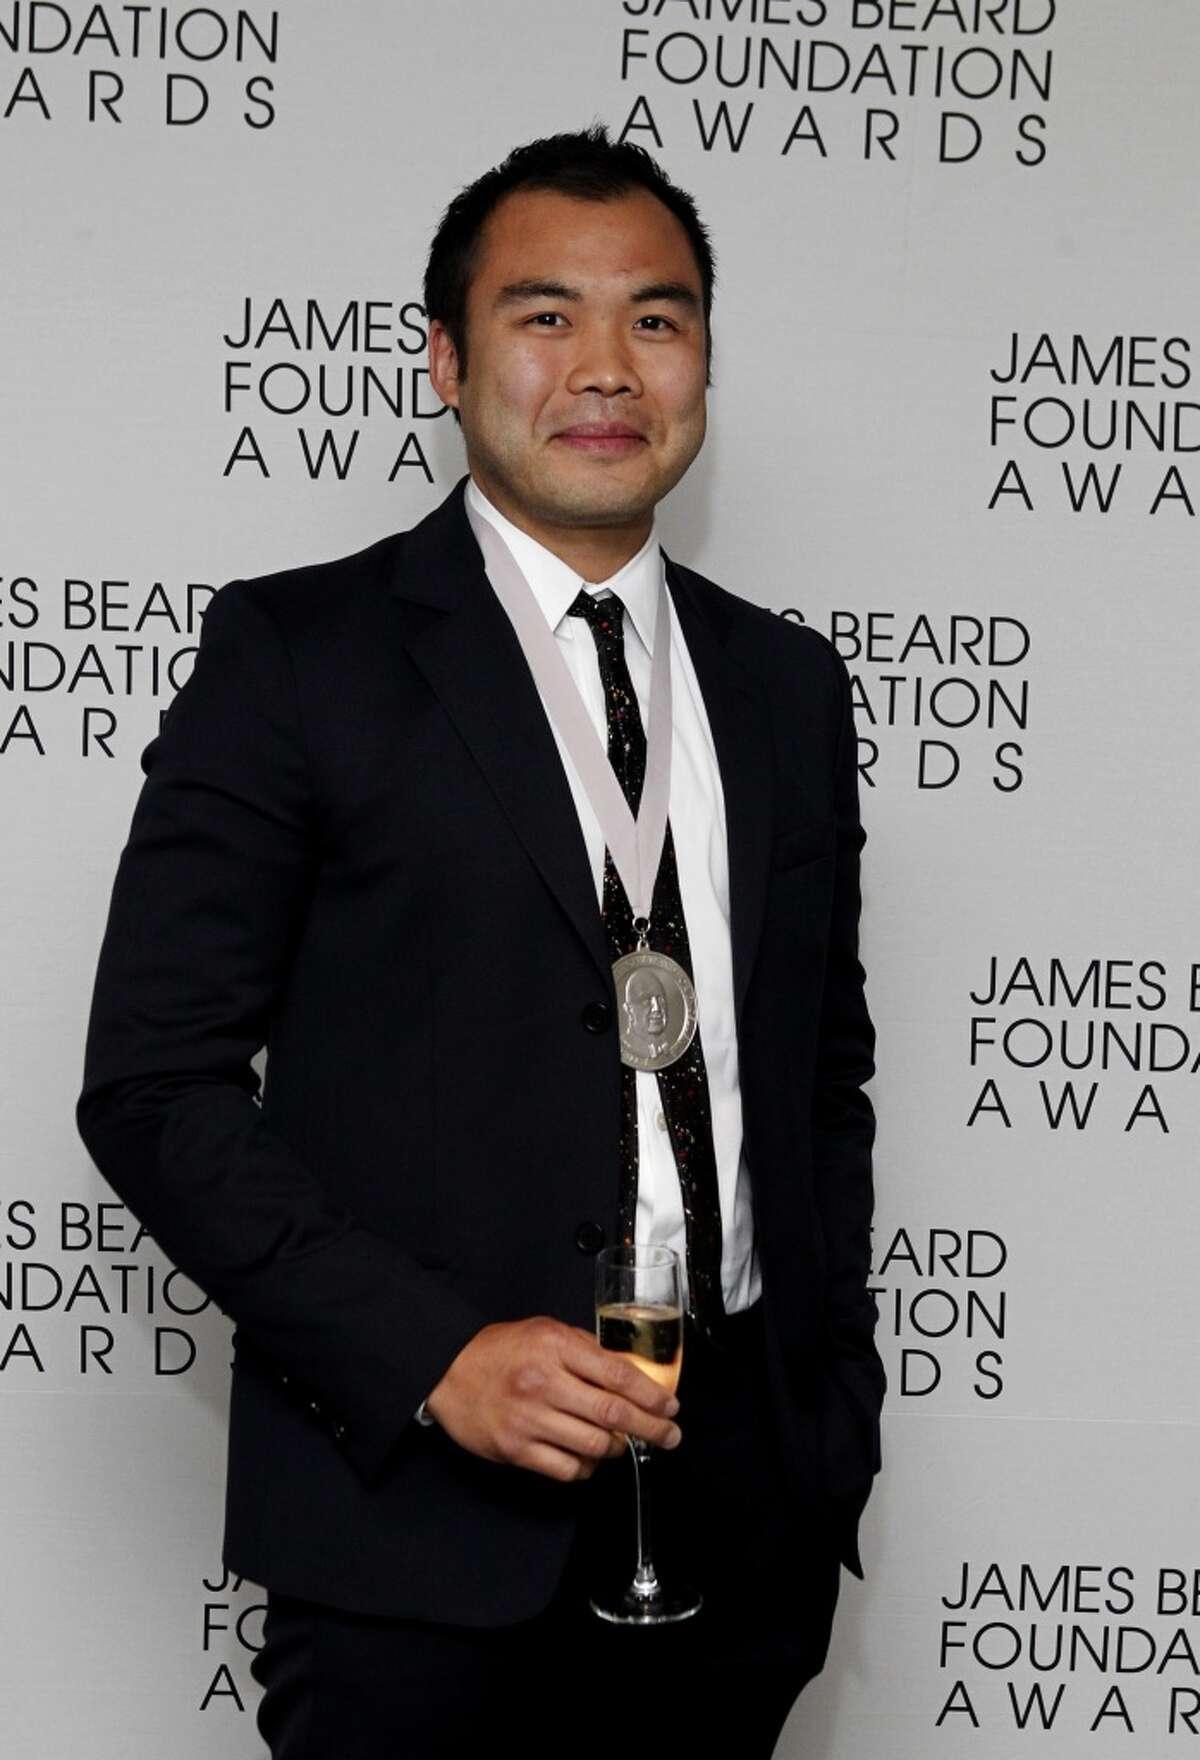 Paul Qui won Best Chef Southwest at the 2012 James Beard Awards.